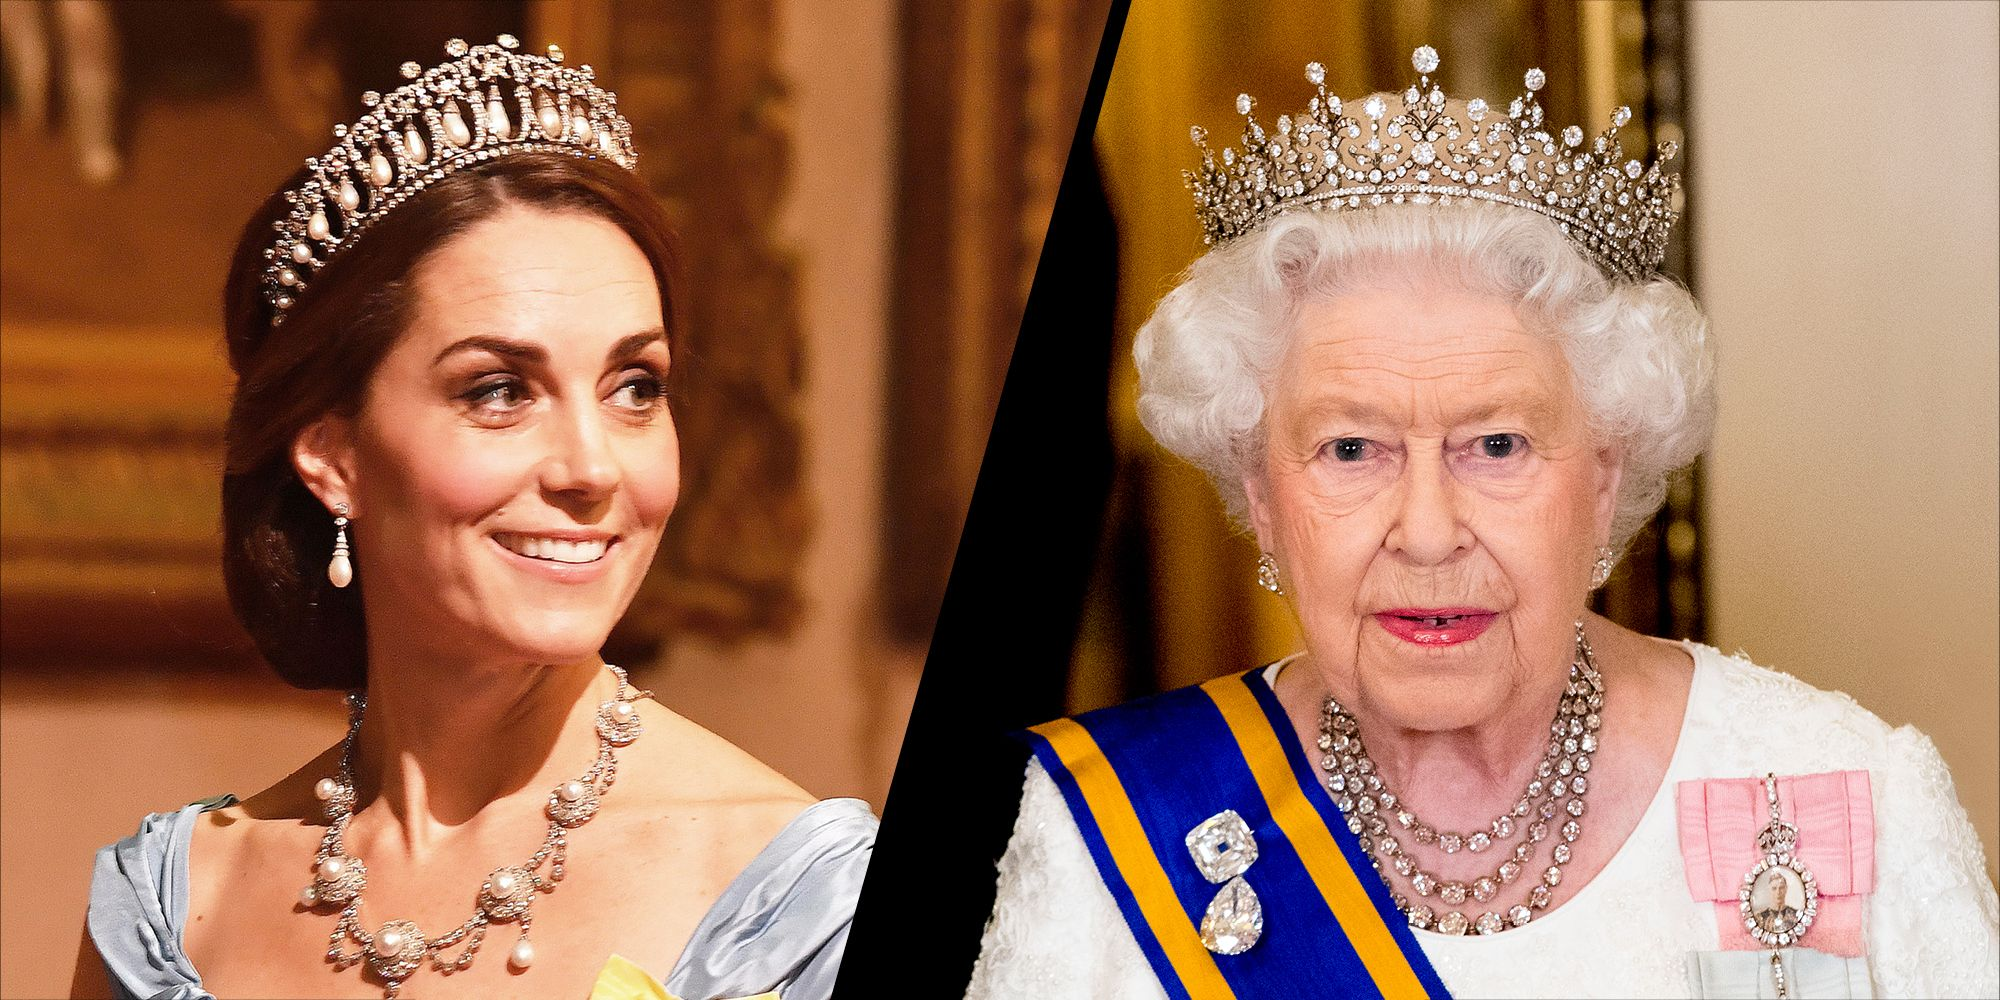 Kate Middleton, The Queen wearing tiaras